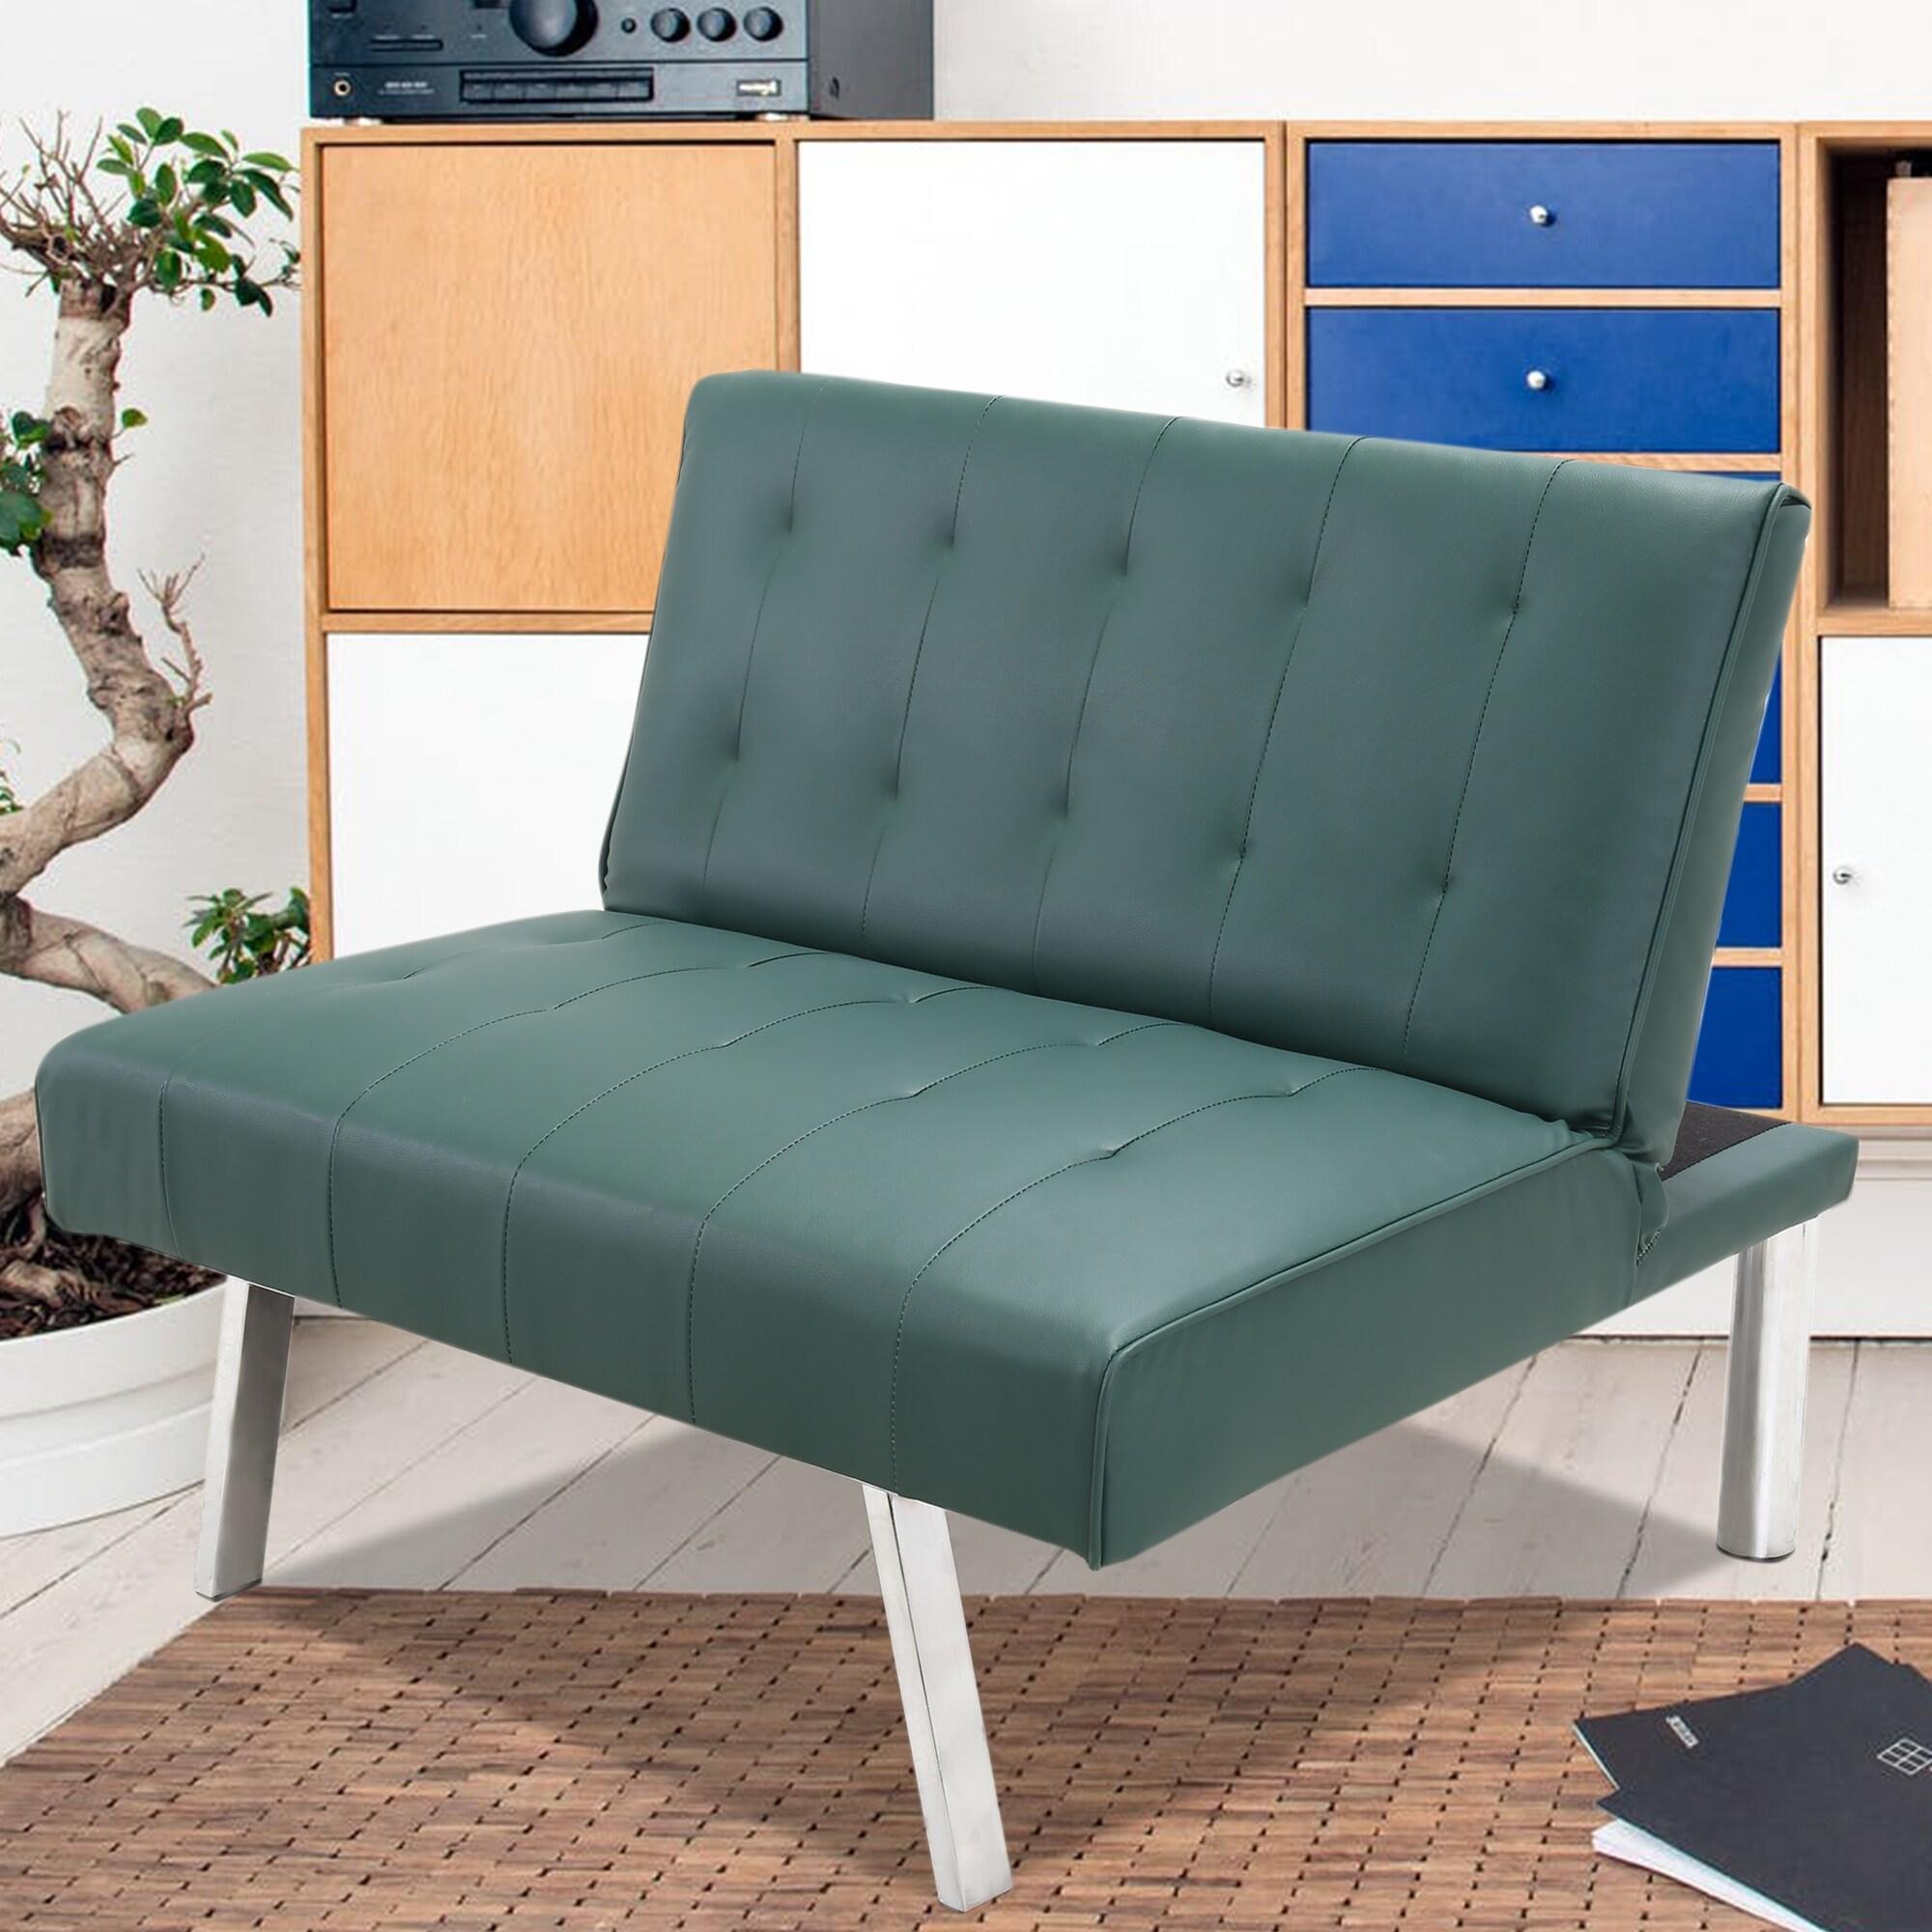 Pu Leather Convertible Folding Sofa